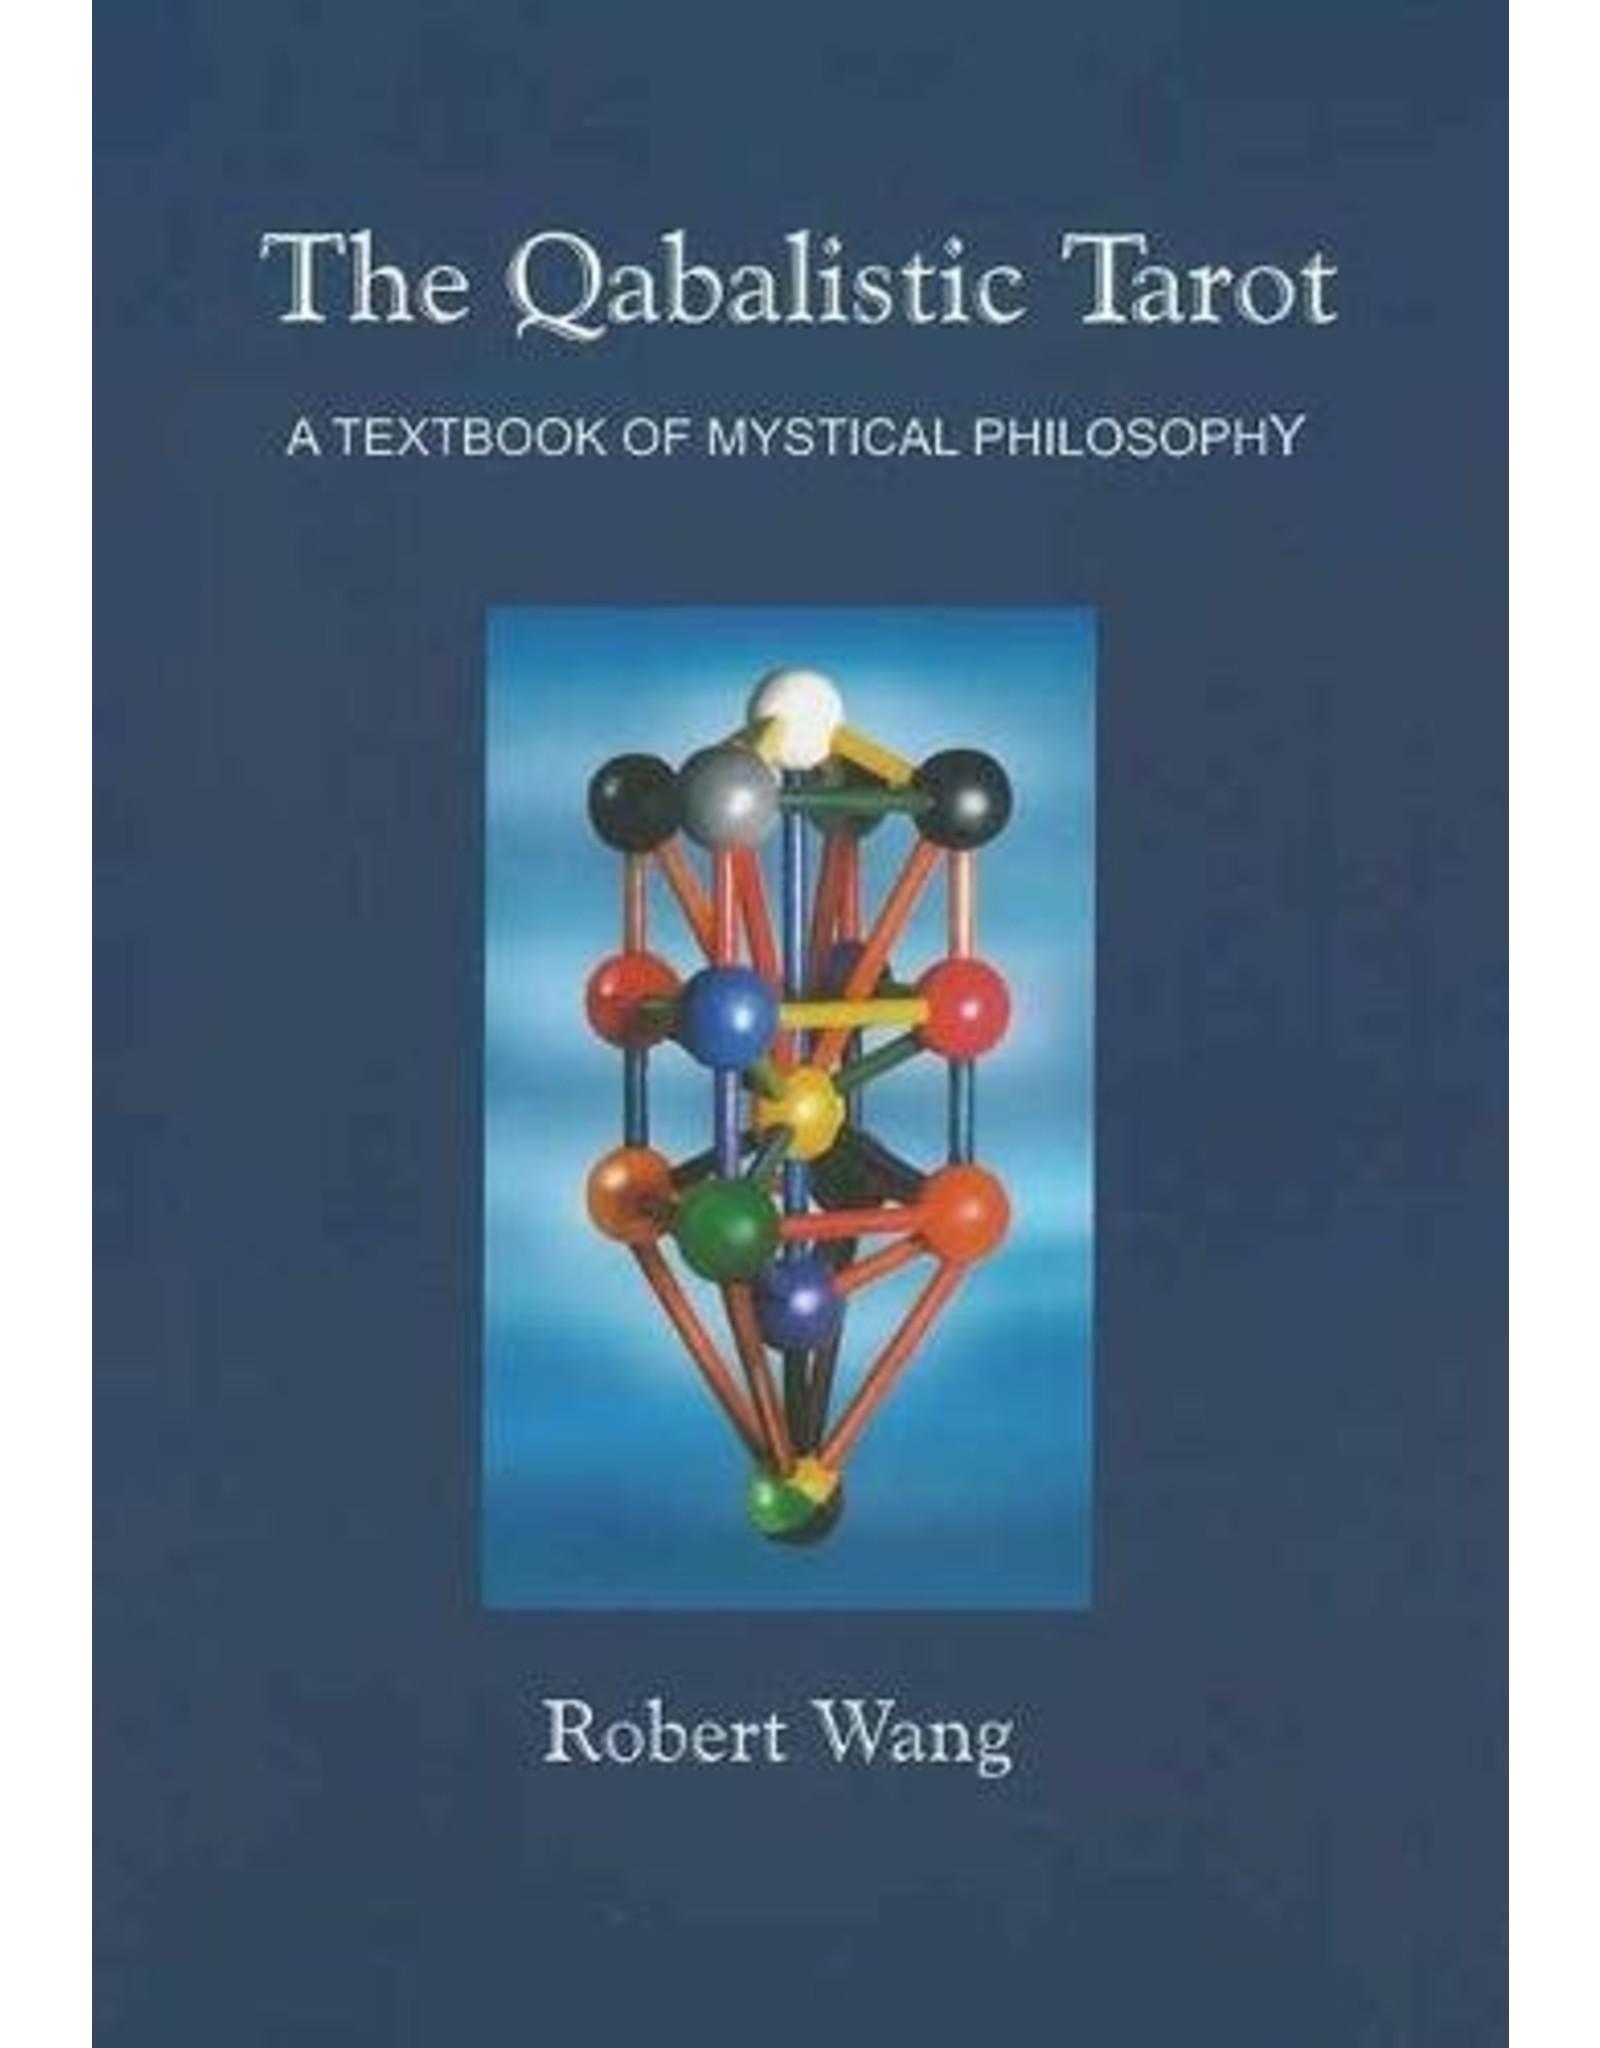 The Qabalistic Tarot: A Textbook of Mystical Philosophy